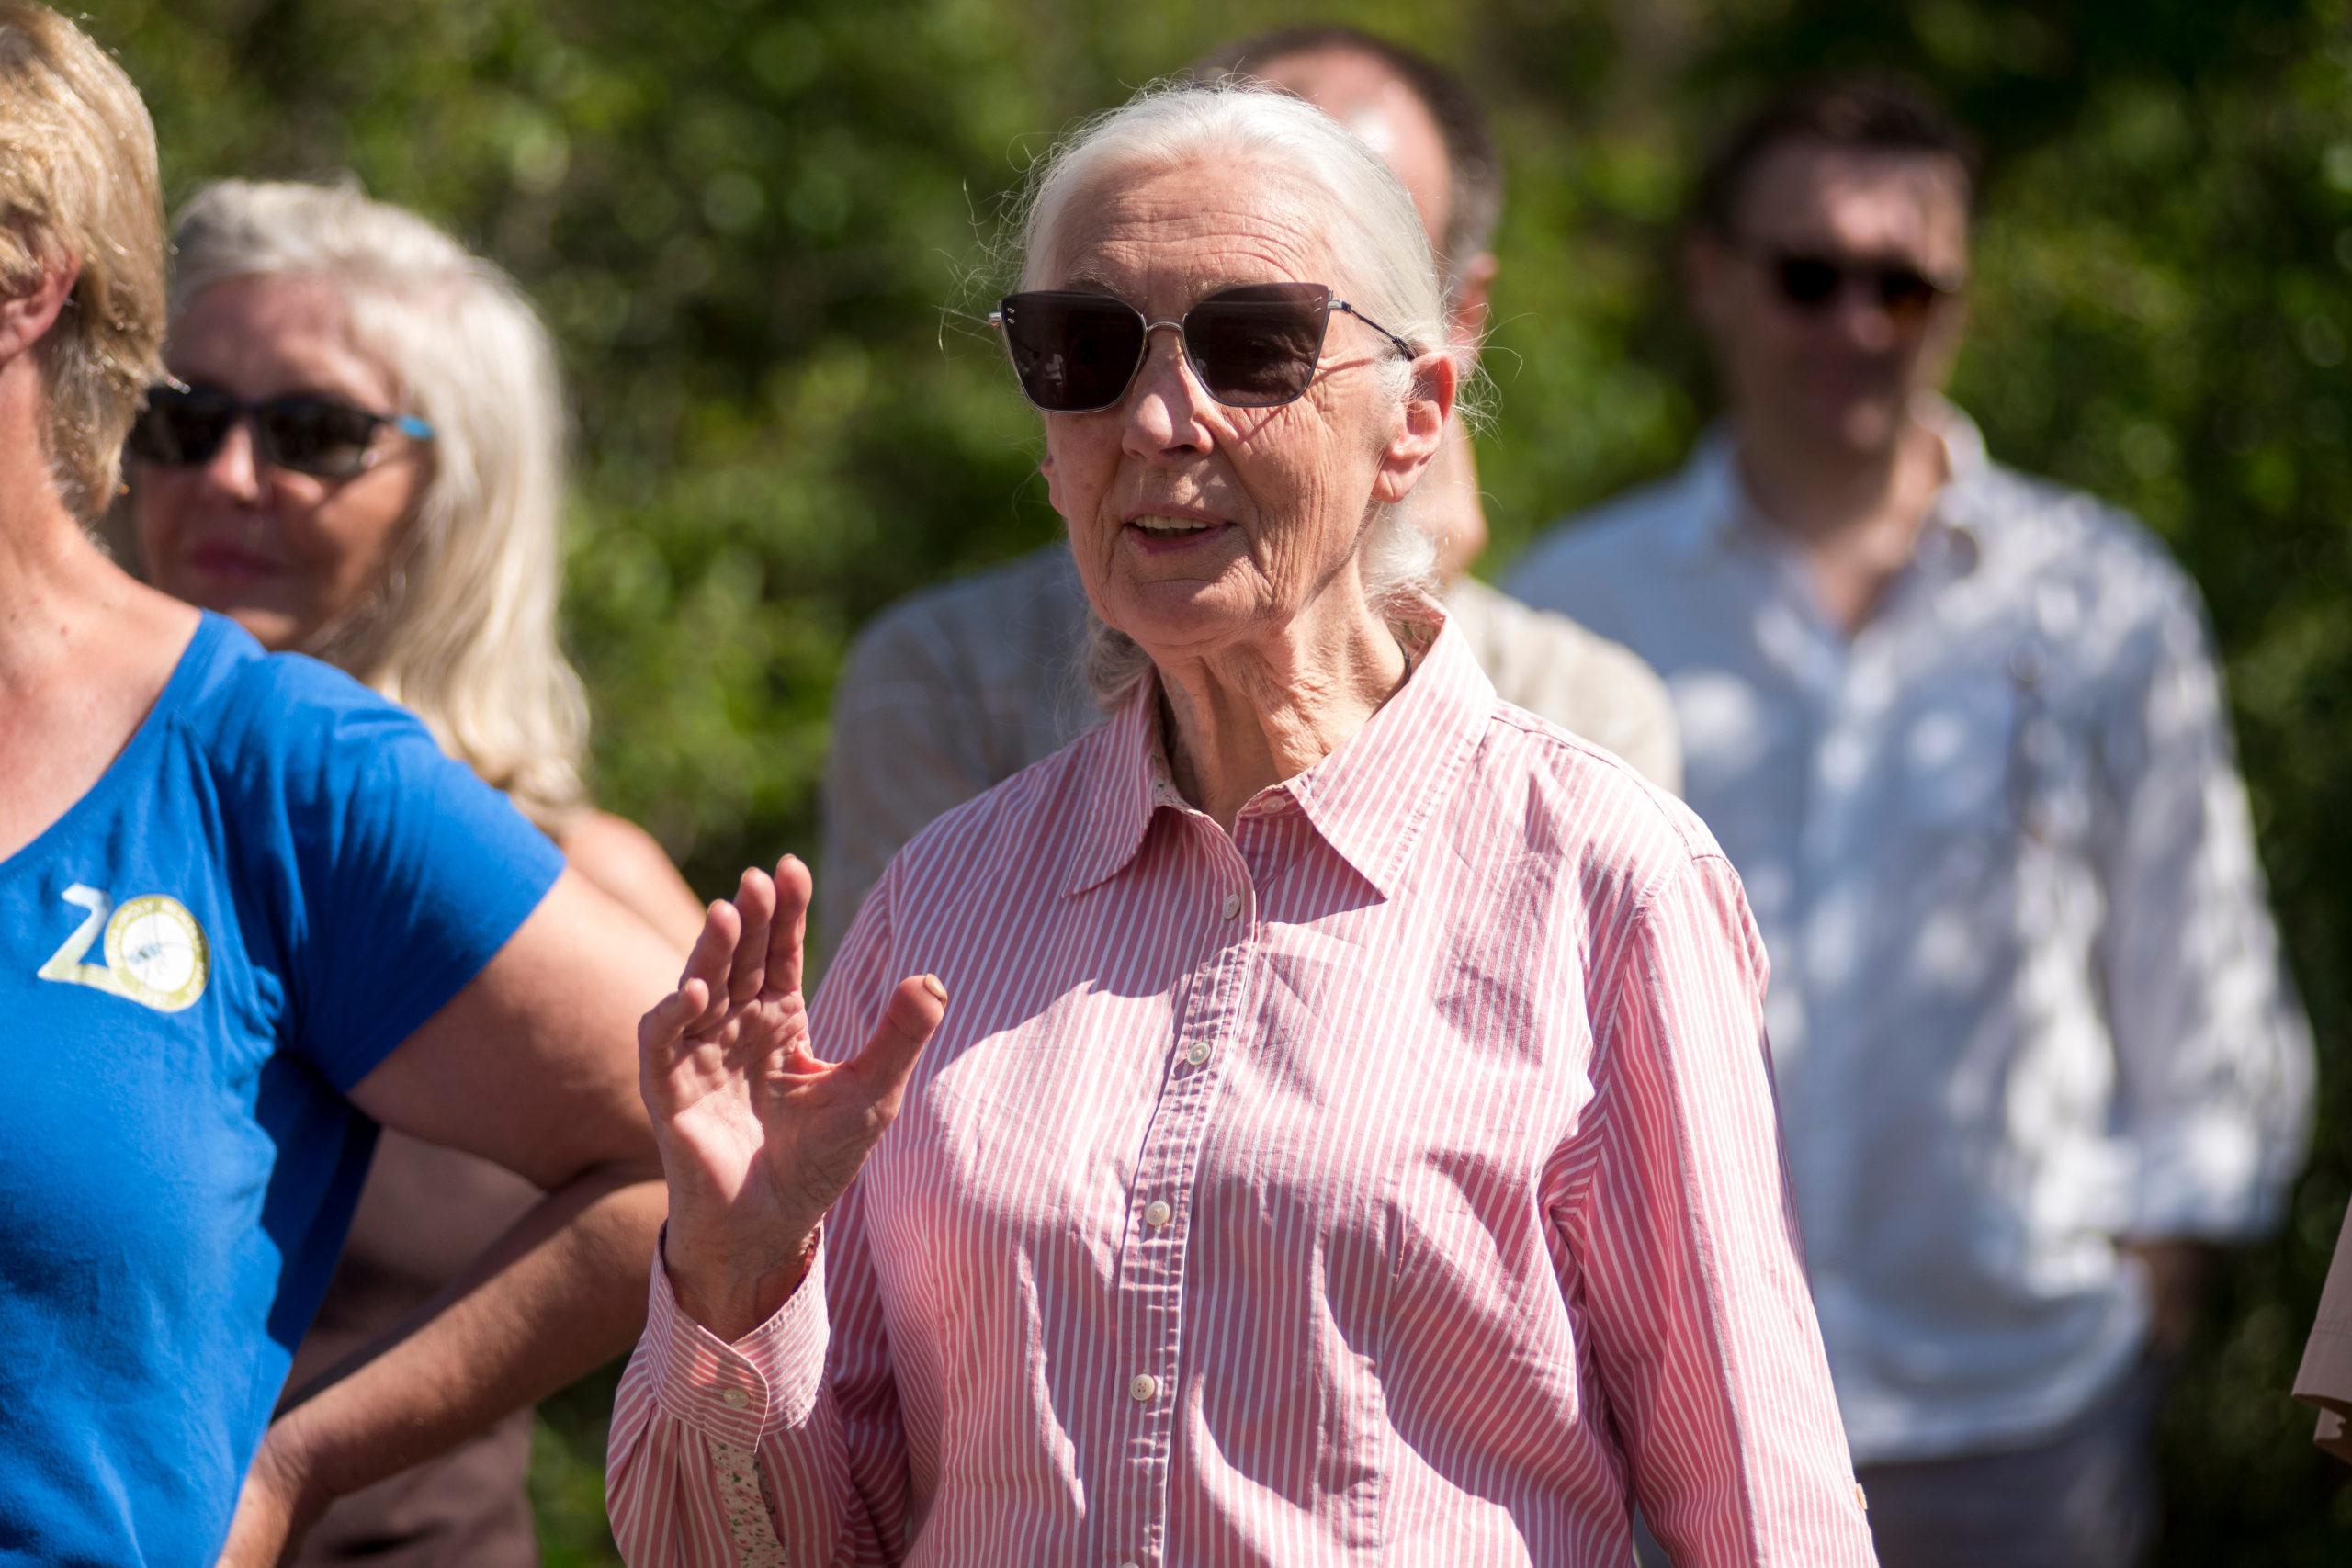 Jane Goodall impulsa movimiento para plantar ¡un billón de árboles!